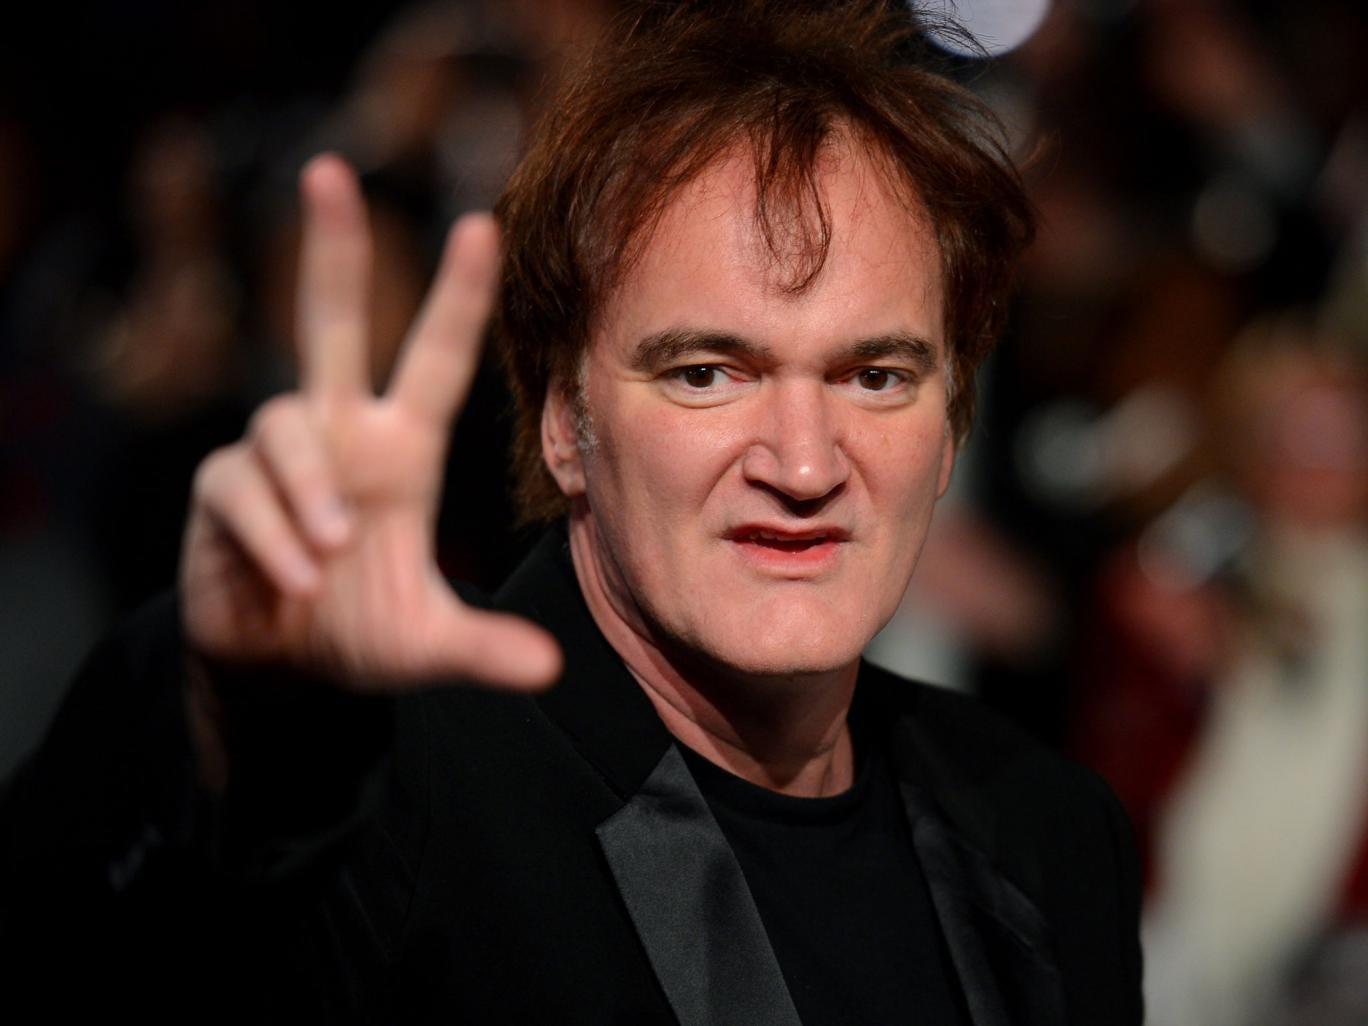 Tarantino said his inspiration was The Jungle Book